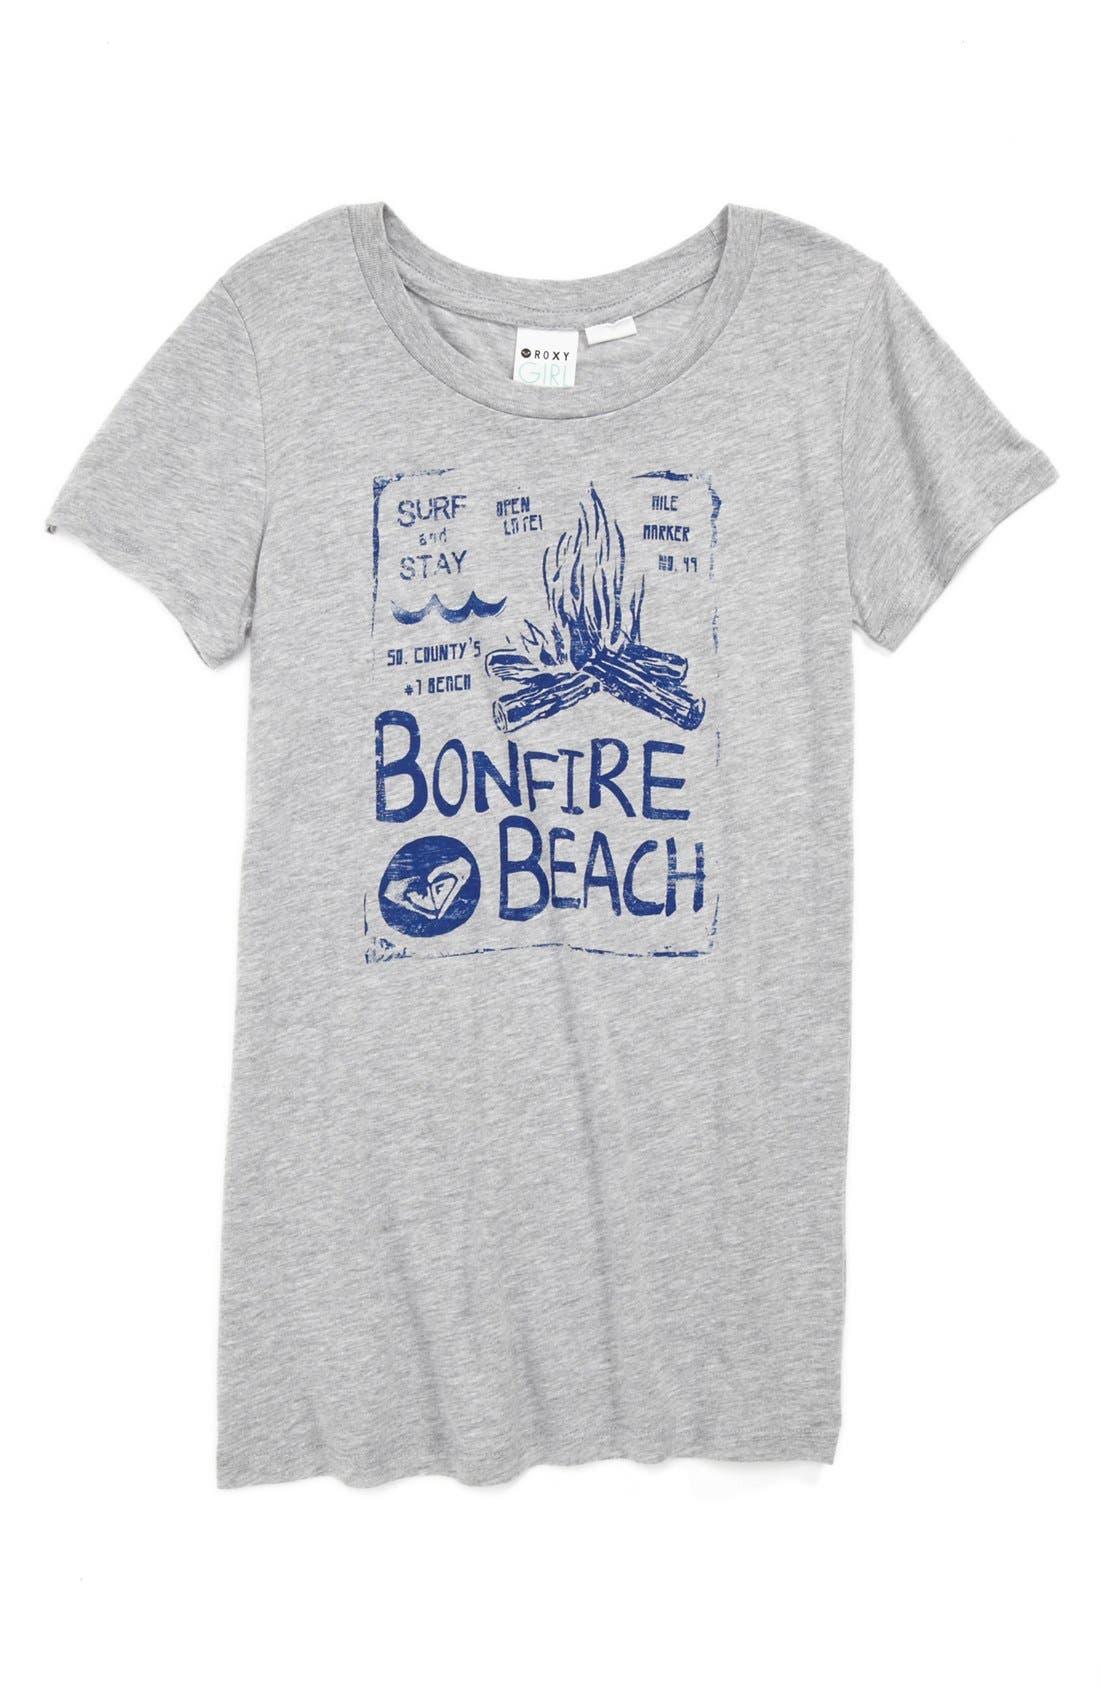 Main Image - Roxy 'Bonfire Beach' Graphic Tee (Big Girls)